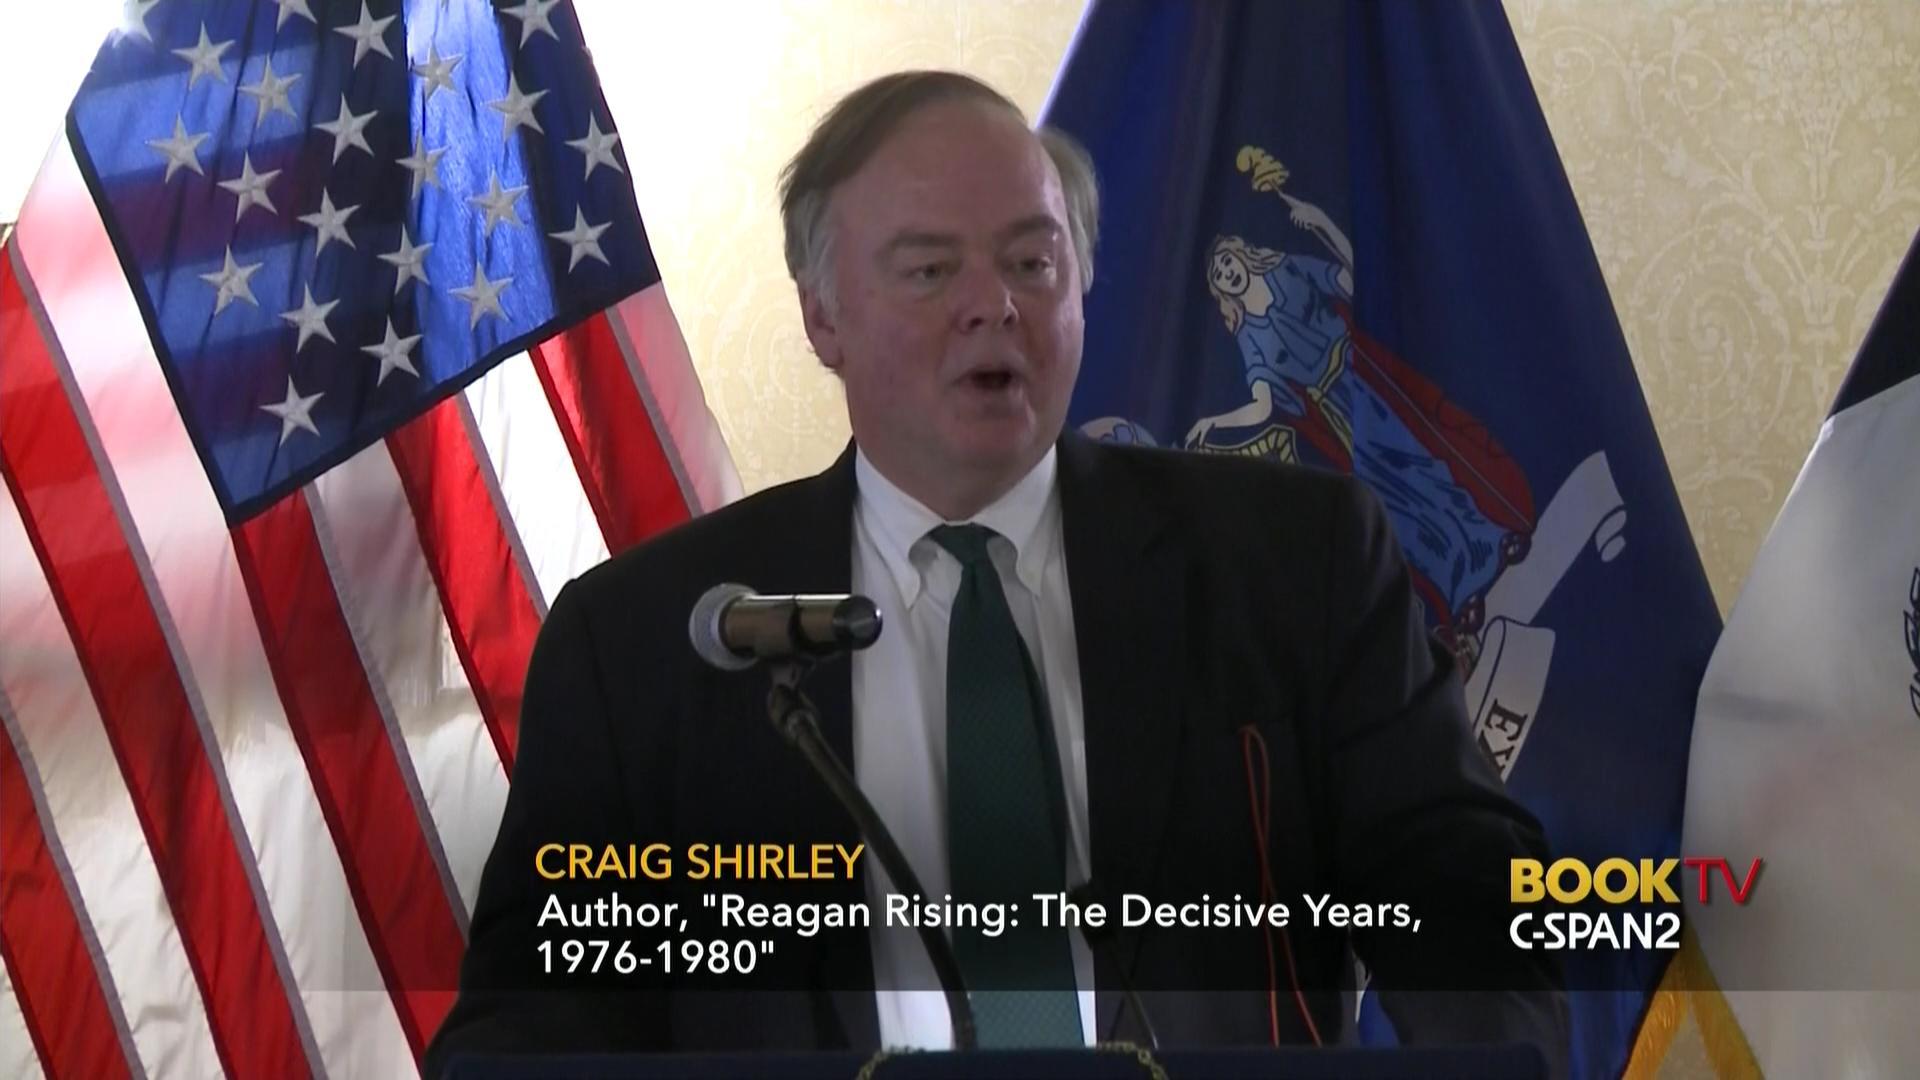 Craig Shirley Discusses Reagan Rising Mar 22 2017 Video